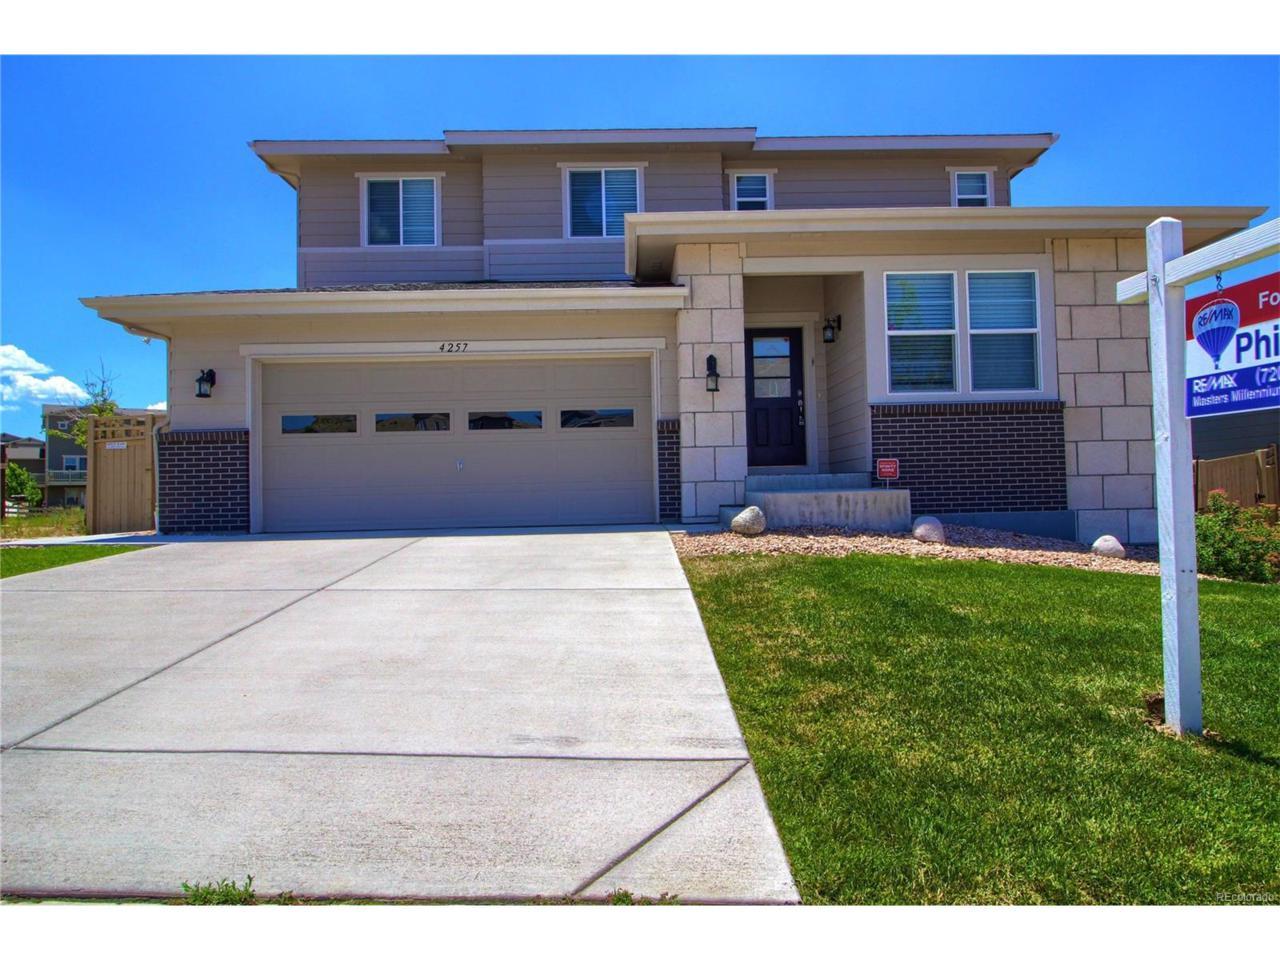 4257 Burnham Trail, Castle Rock, CO 80104 (MLS #3074886) :: 8z Real Estate